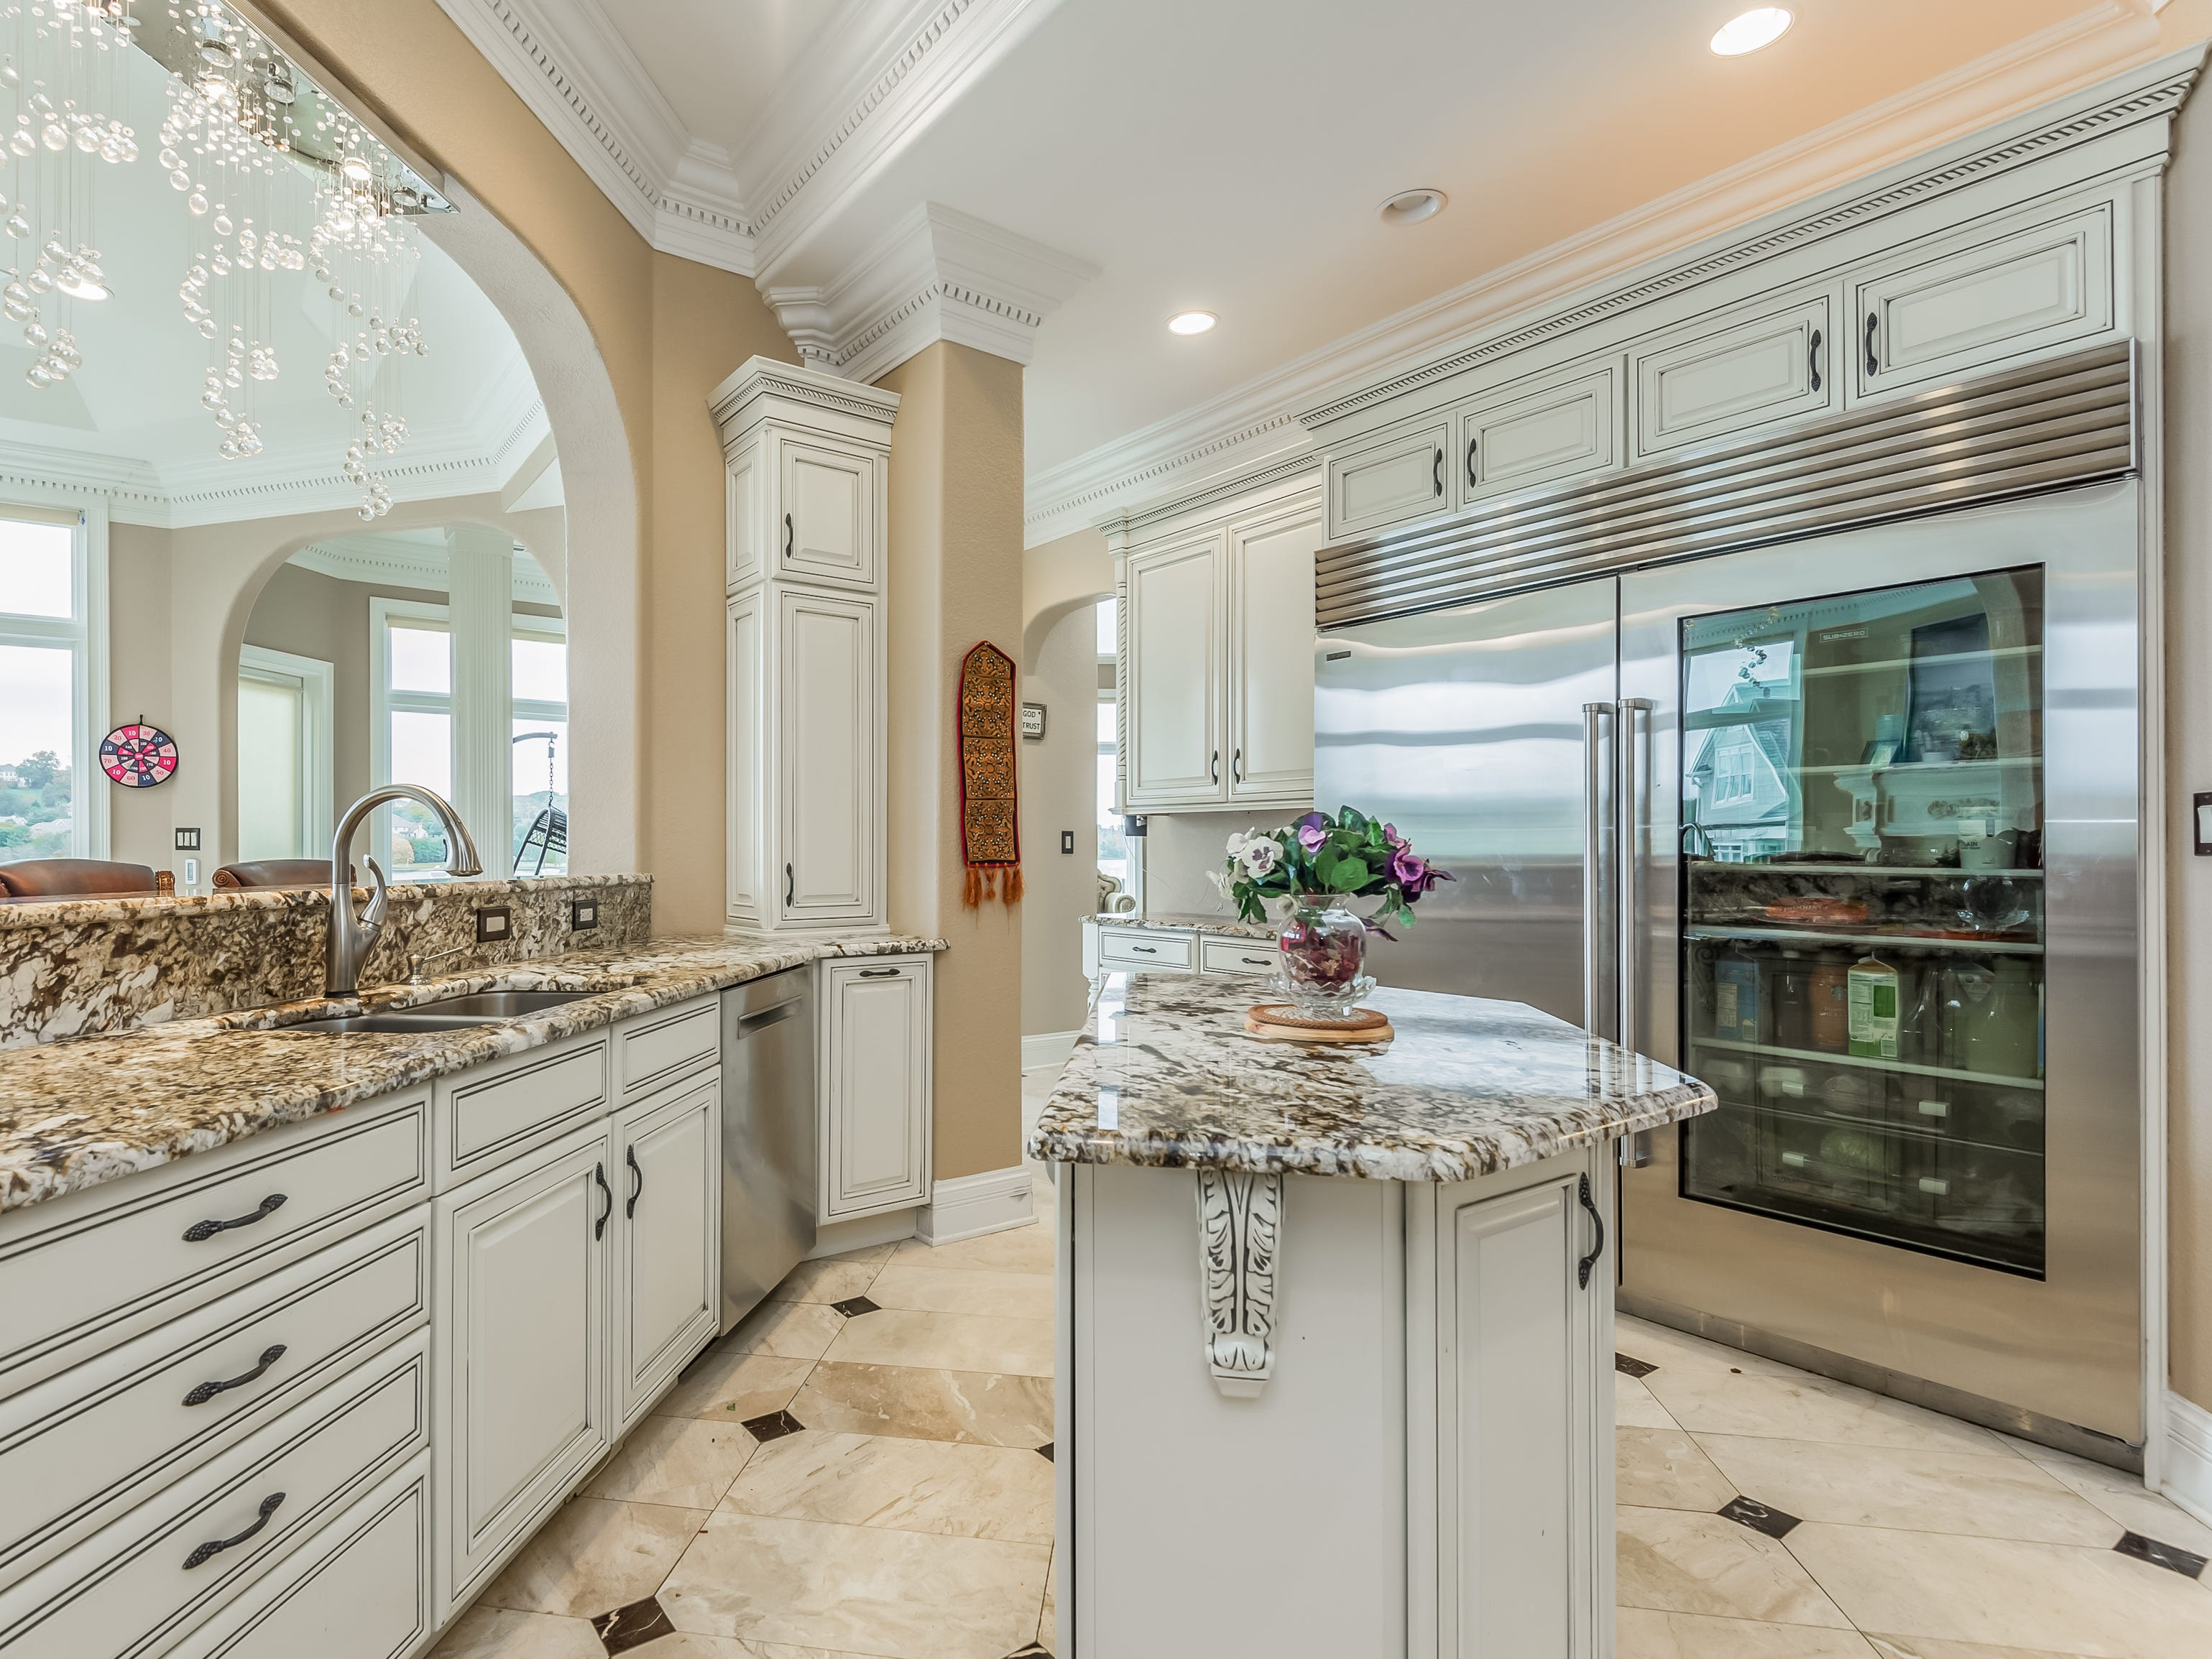 The kitchen includes a subzero fridge and upgraded appliances.